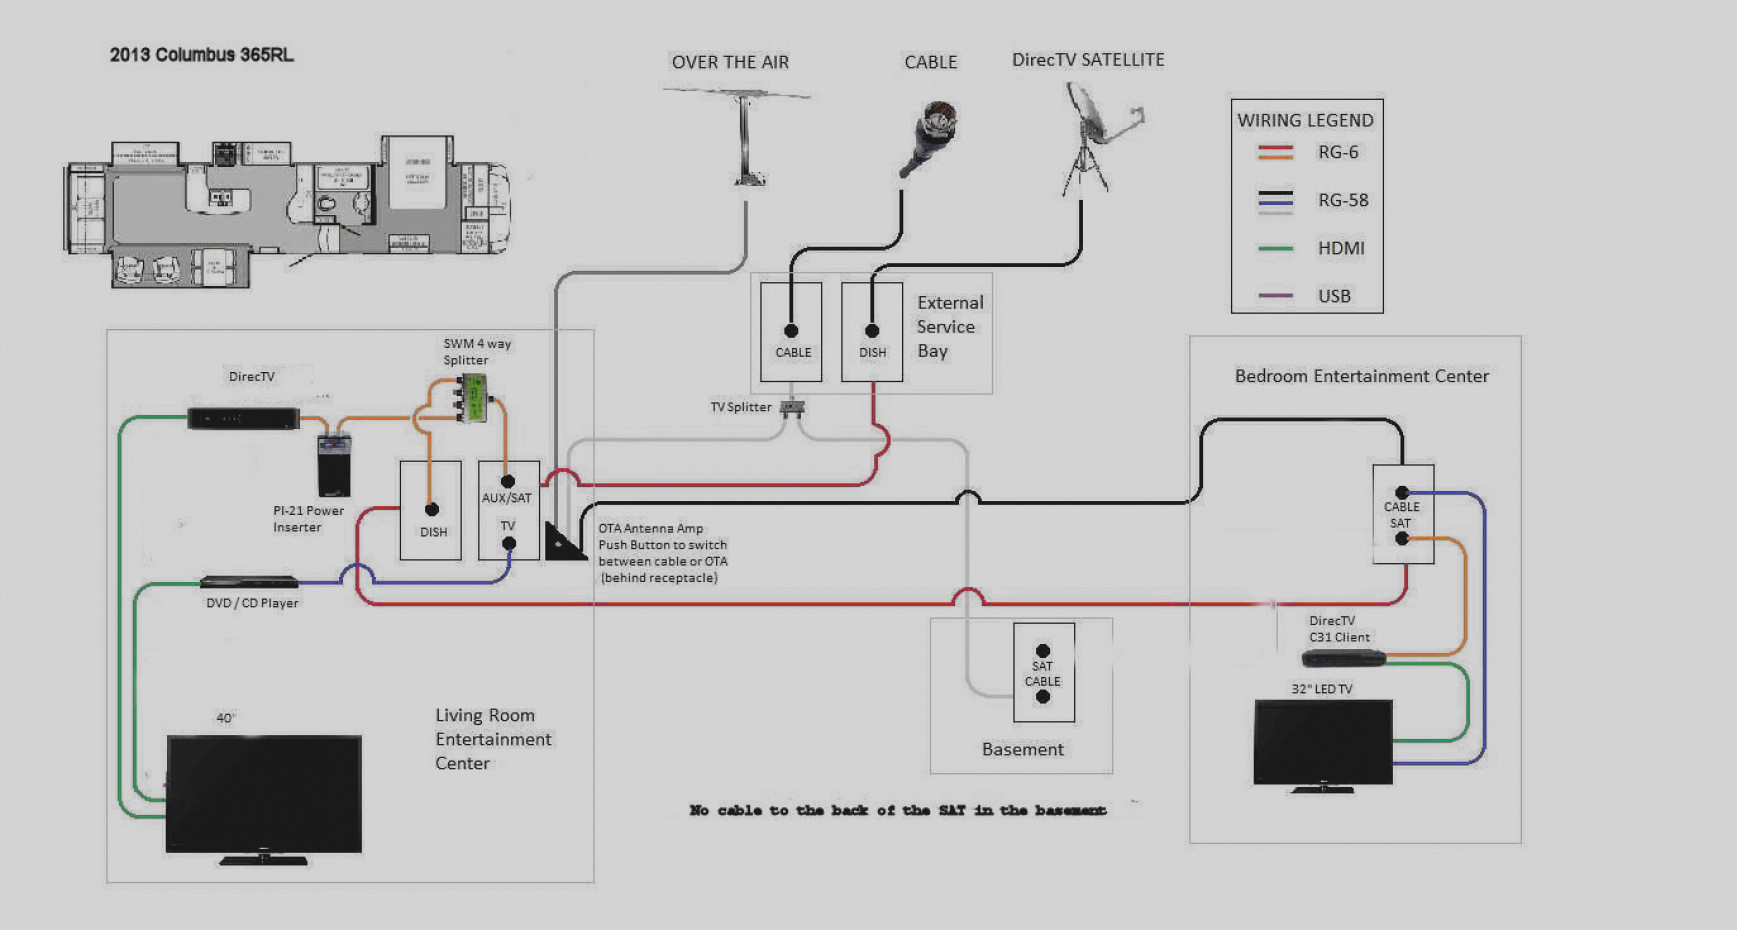 Wiring Diagram Entertainment Center | Wiring Diagram - Rv Satellite Wiring Diagram